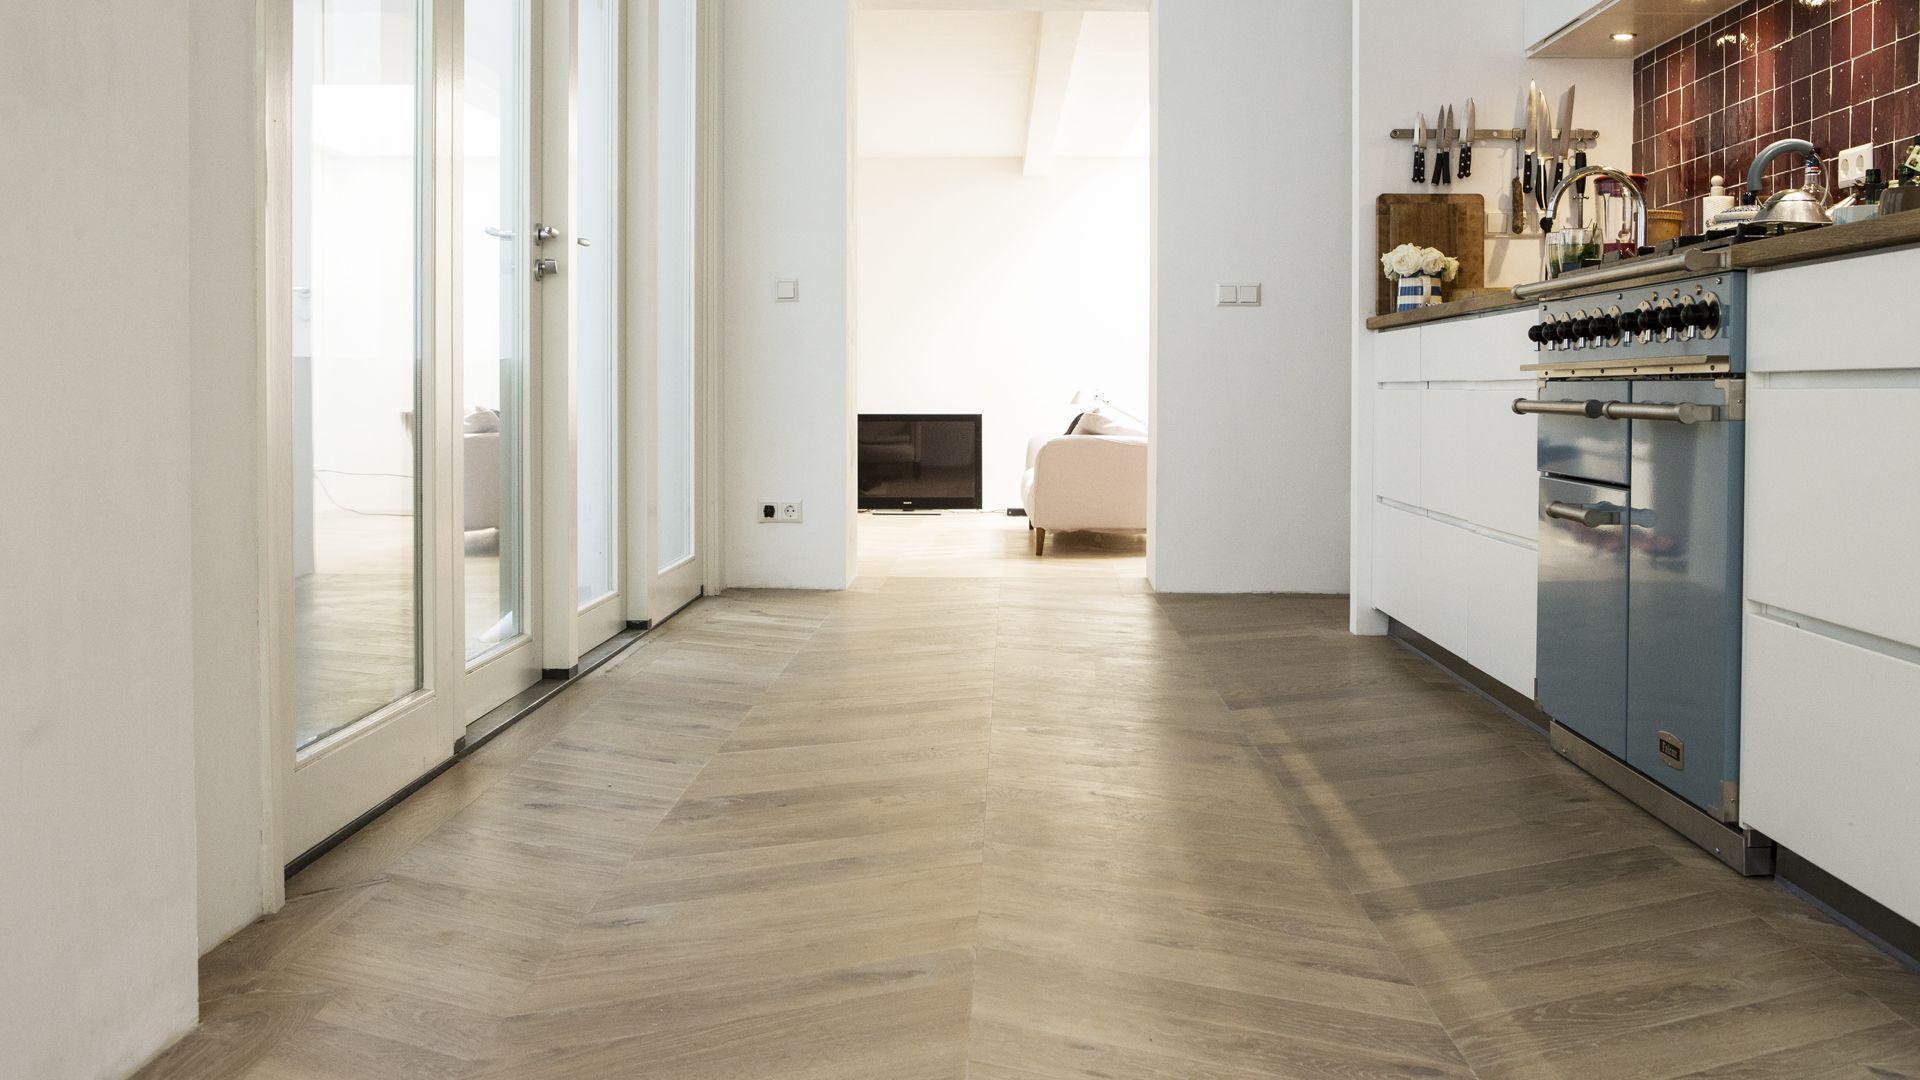 Witte Houten Vloer In Keuken : Houten vloer hongaarse punt in keuken ...